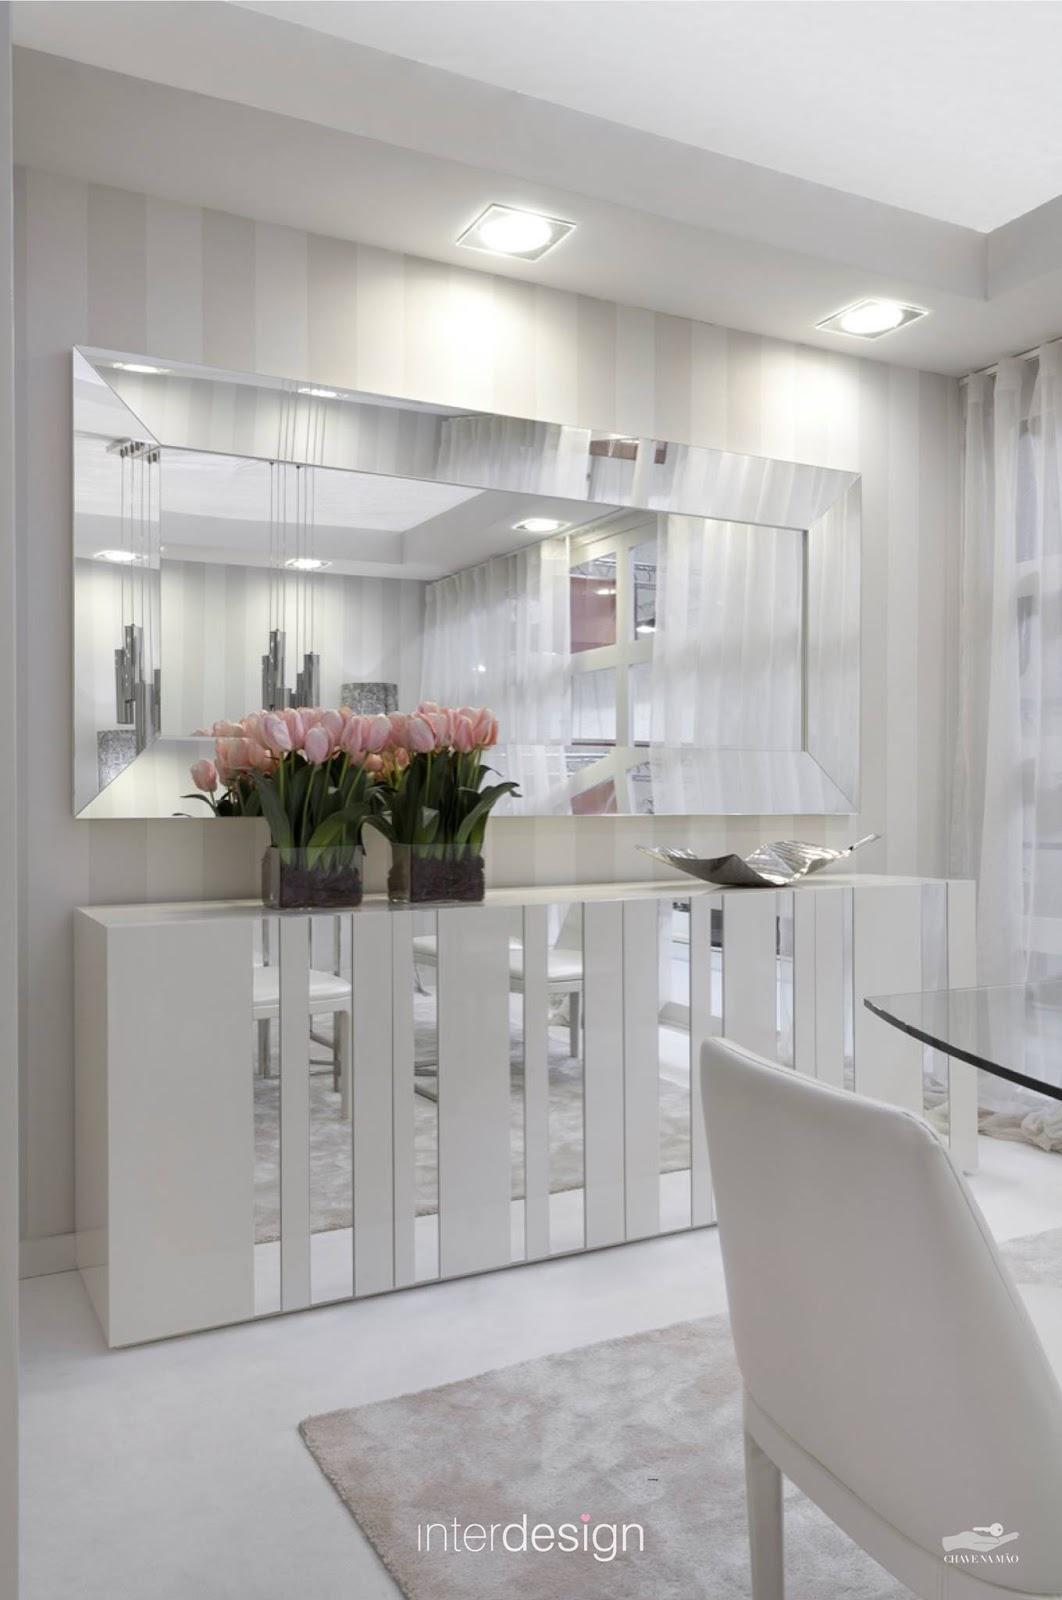 Interdesign : Acessrios e Decorao por Interdesign Interiores